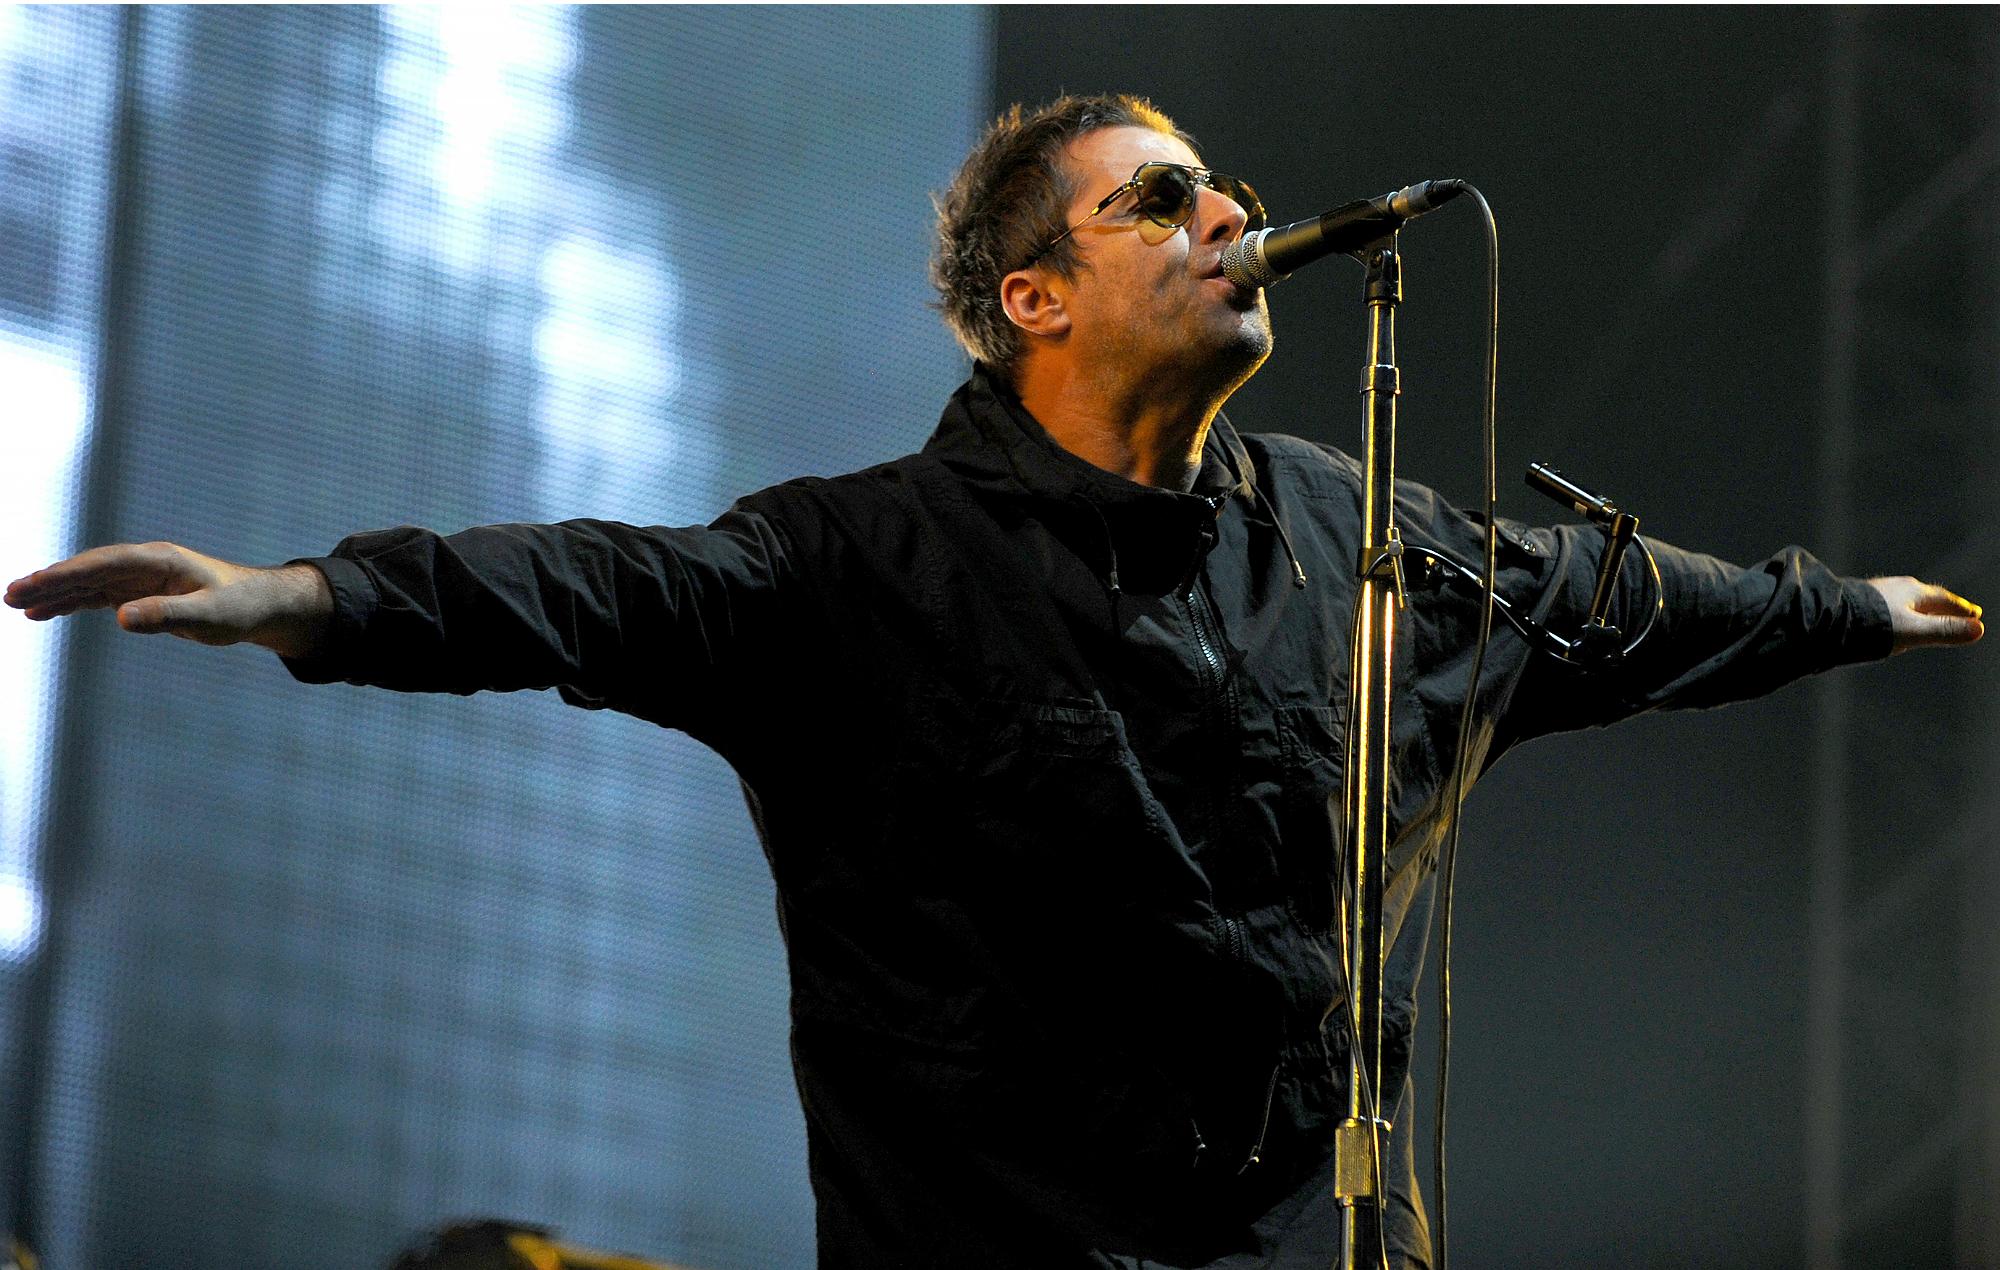 NME Festival blog: Has Liam Gallagher confirmed he's headlining Glastonbury 2019?